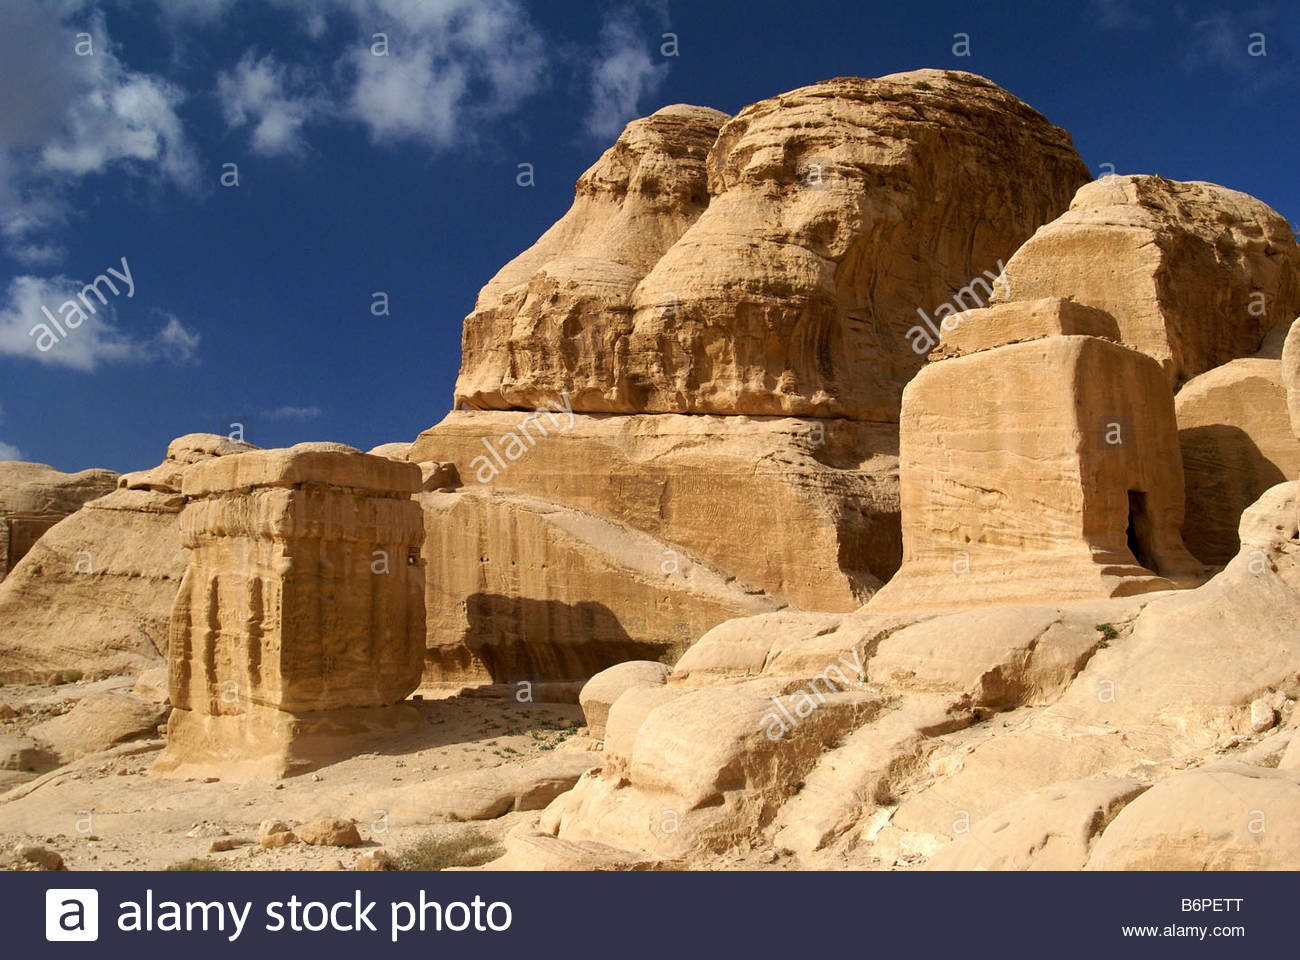 Djinn bloques - tumbas de Petra en Jordania Imagen De Stock